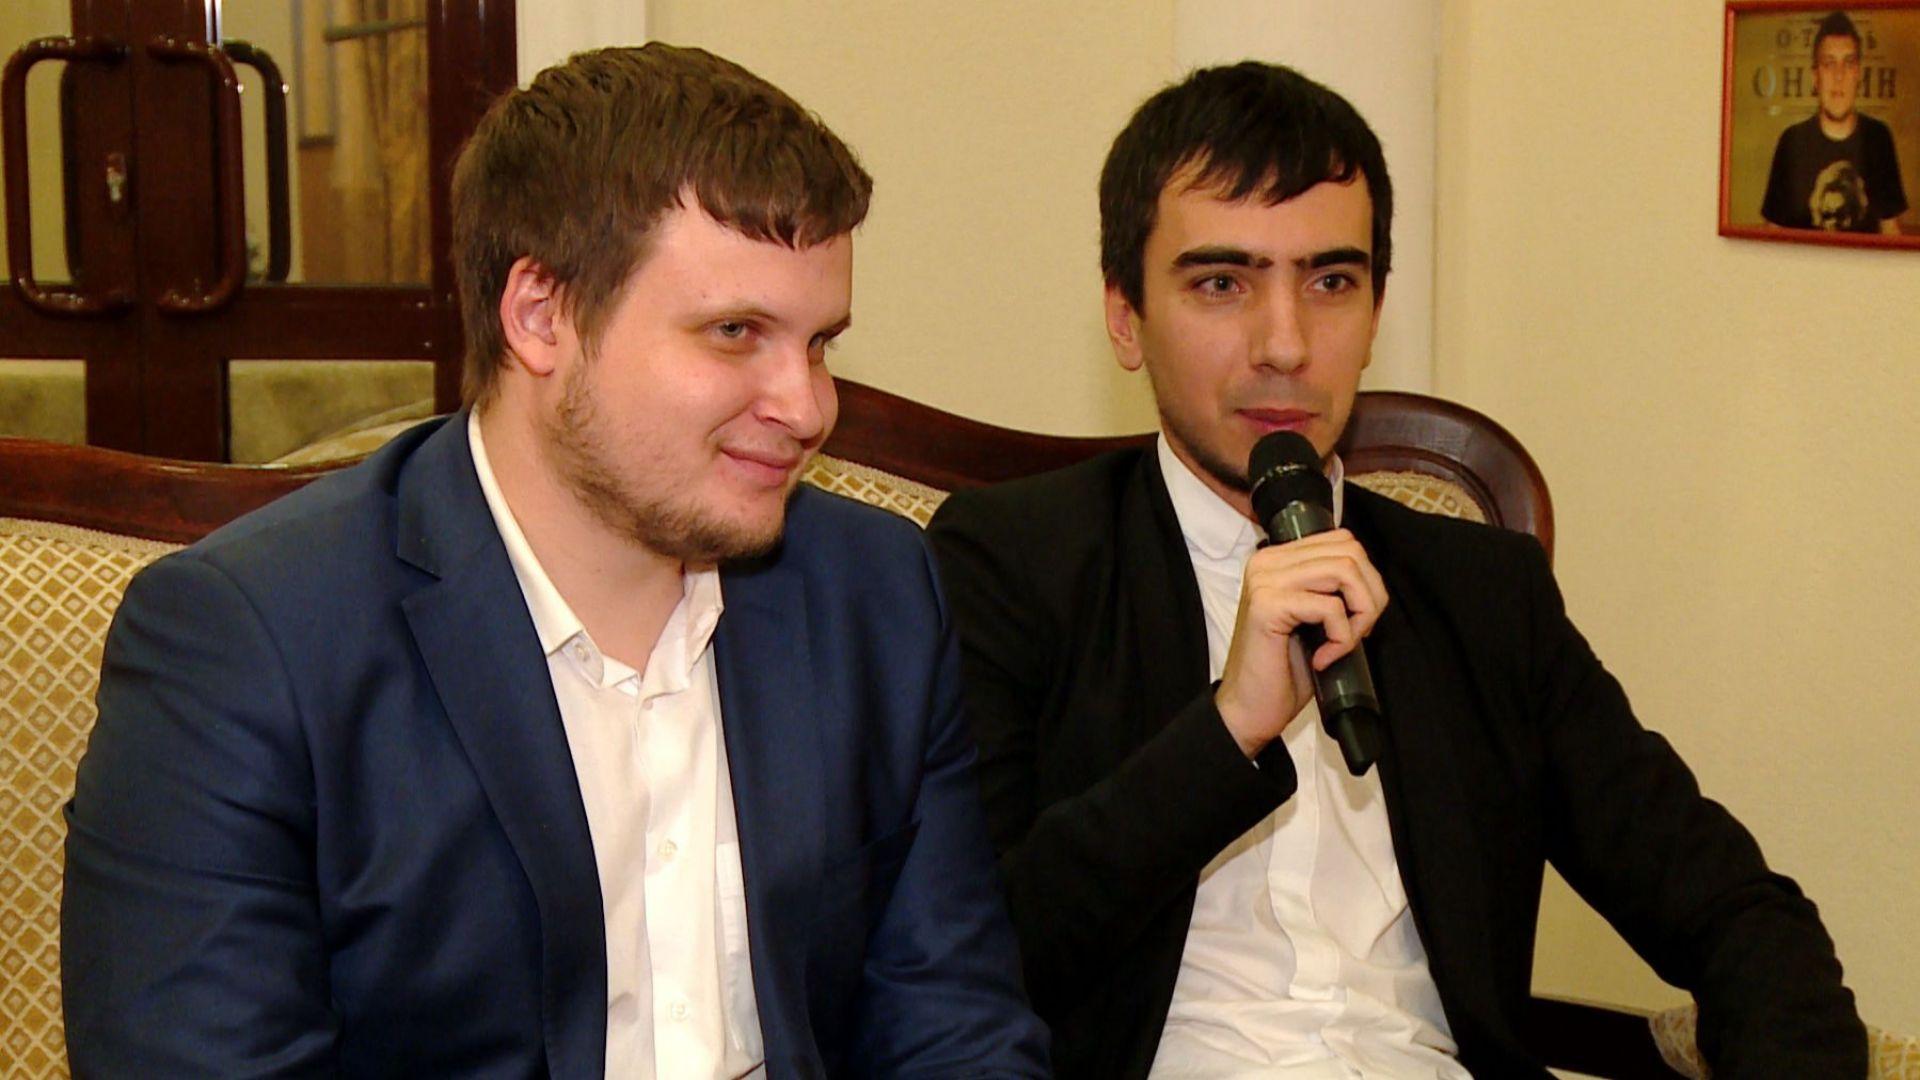 Те са двама руски шегаджии, успели да измамят много личности